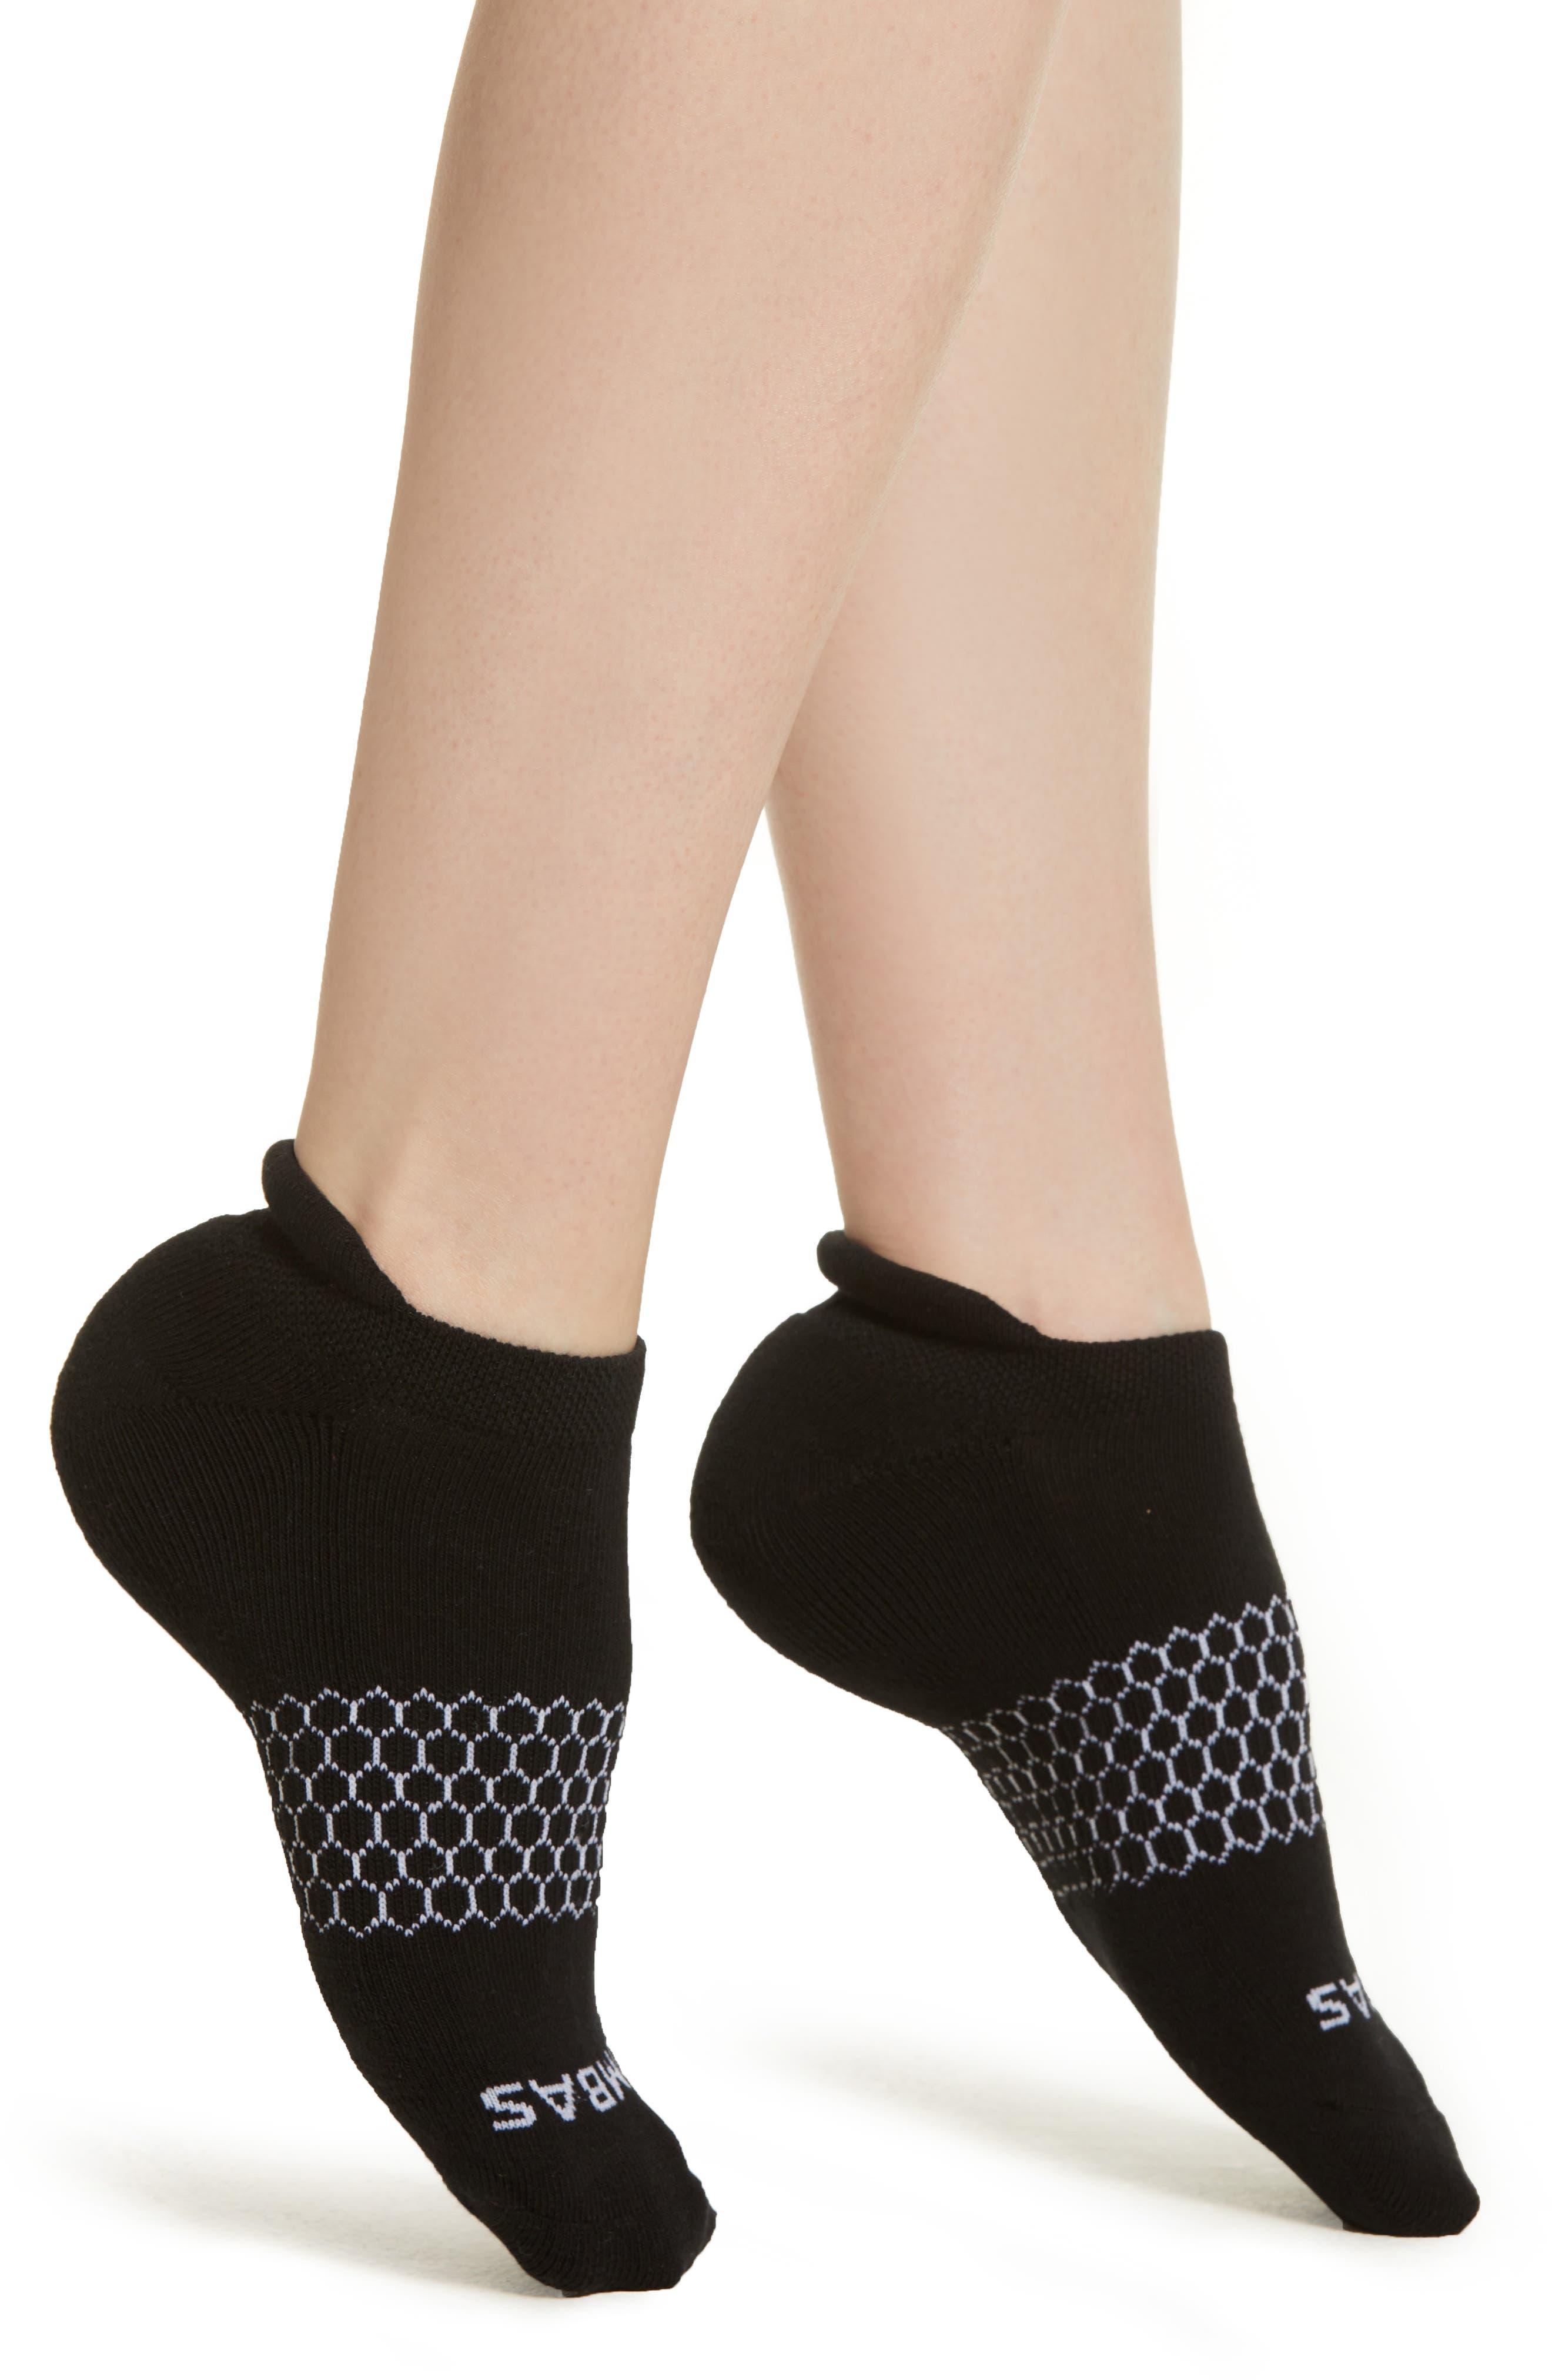 BOMBAS Solid Ankle Socks, Main, color, BLACK